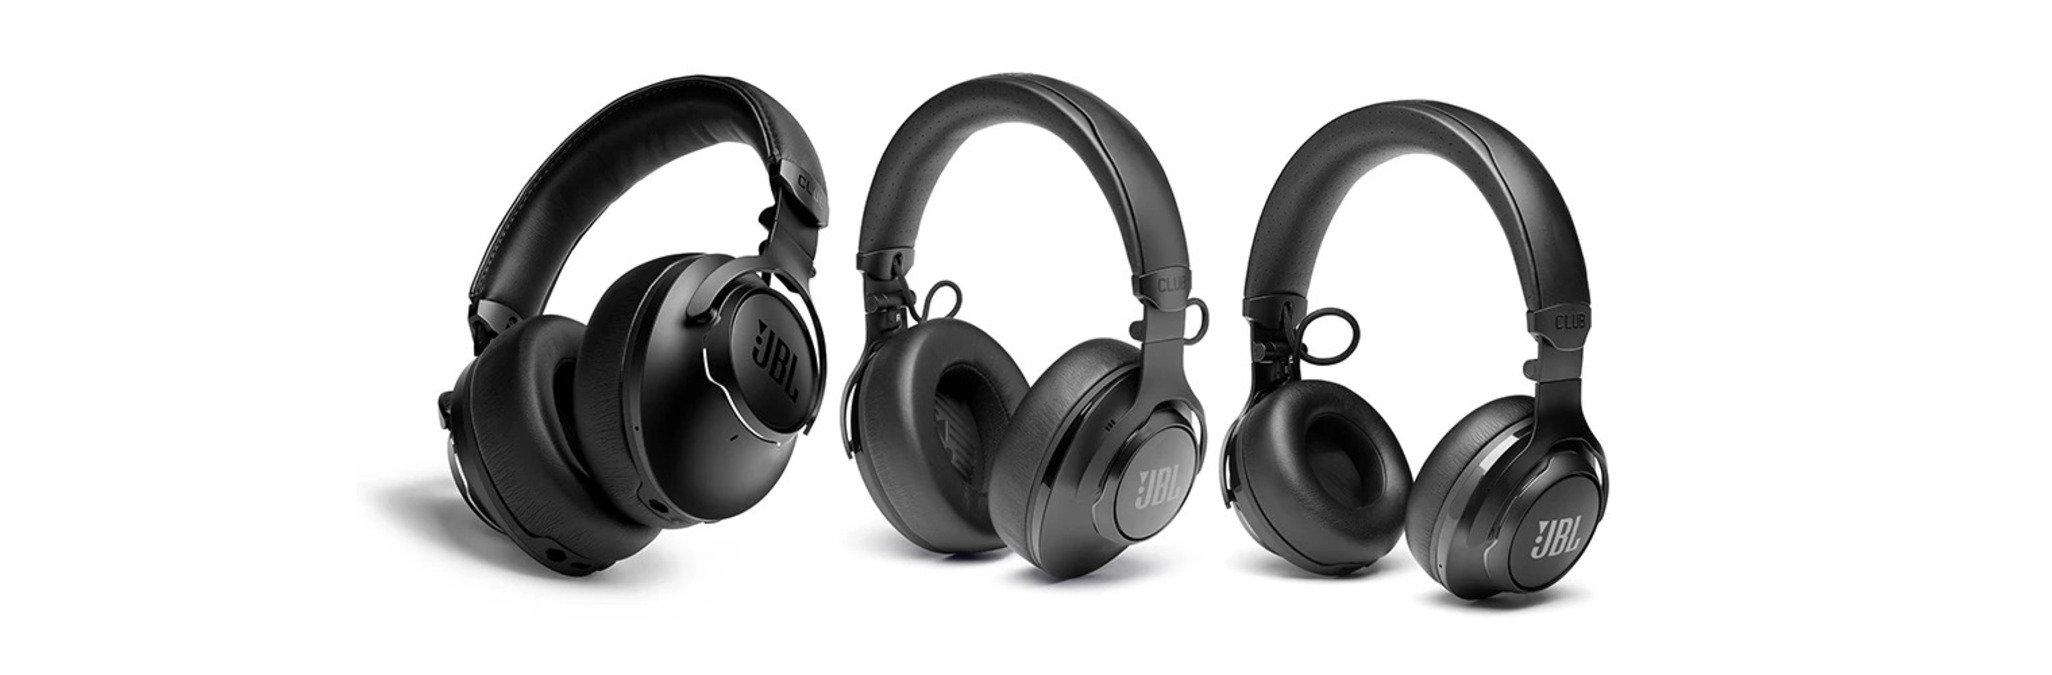 JBL Club Headphones